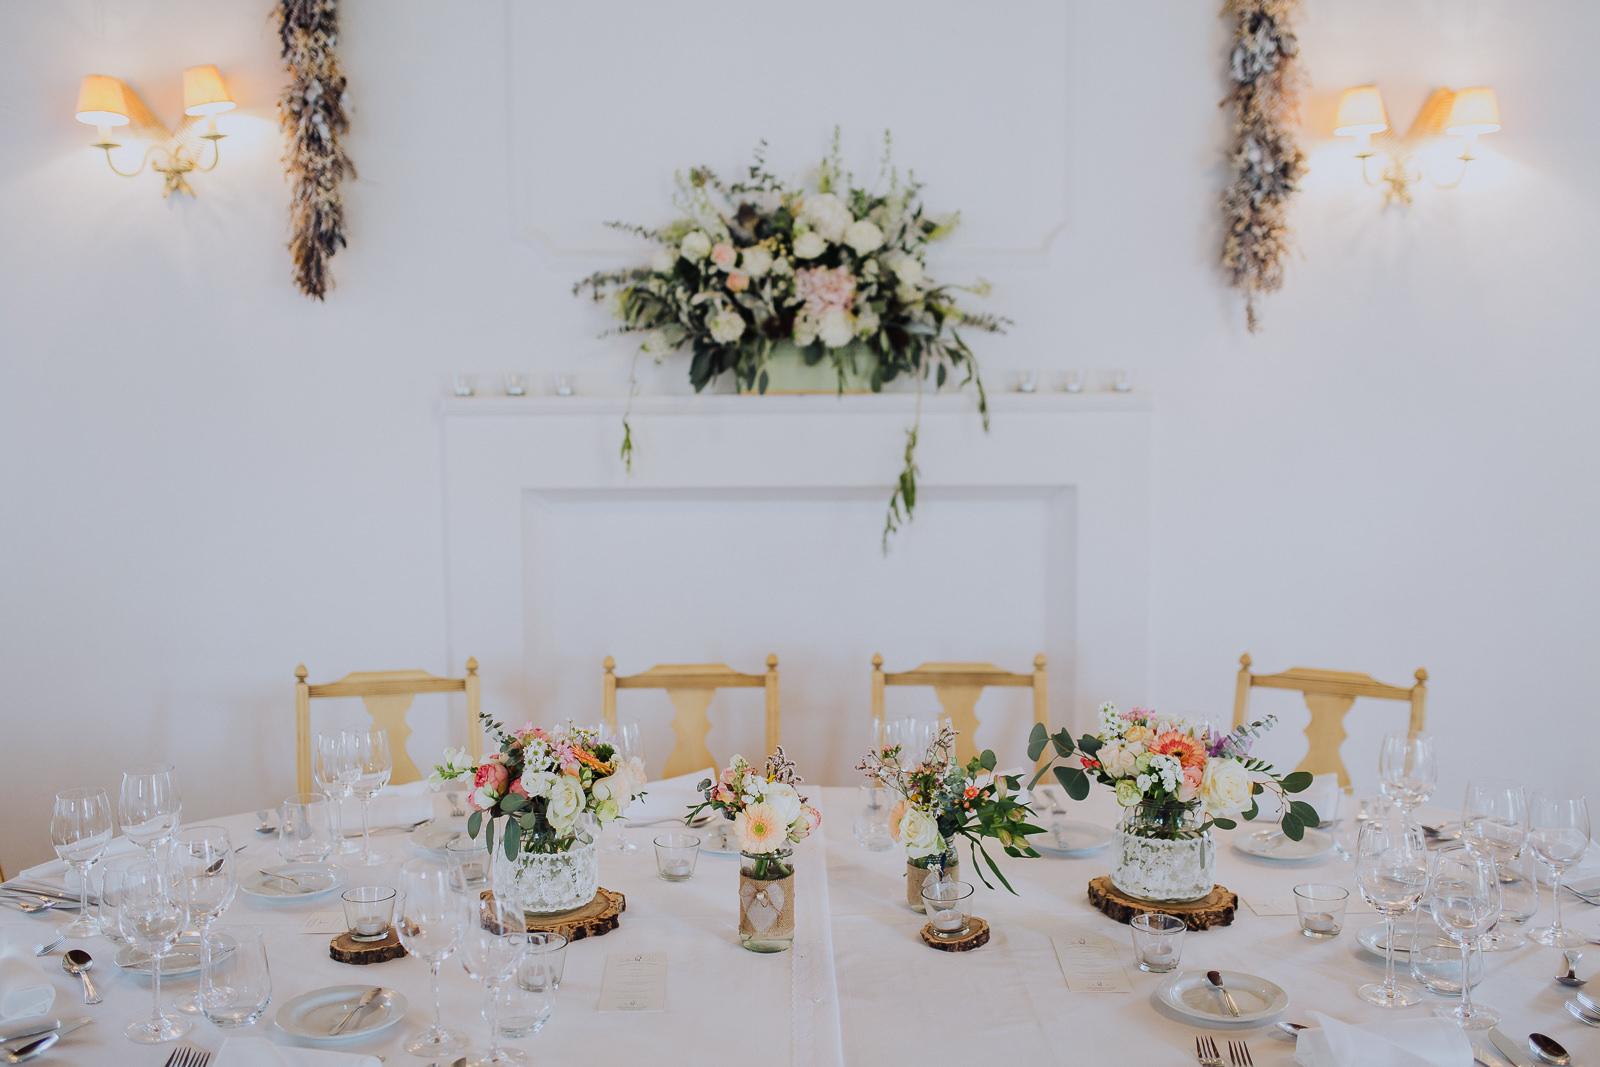 wedding_quinta_santana_mafra_portugal_047.jpg